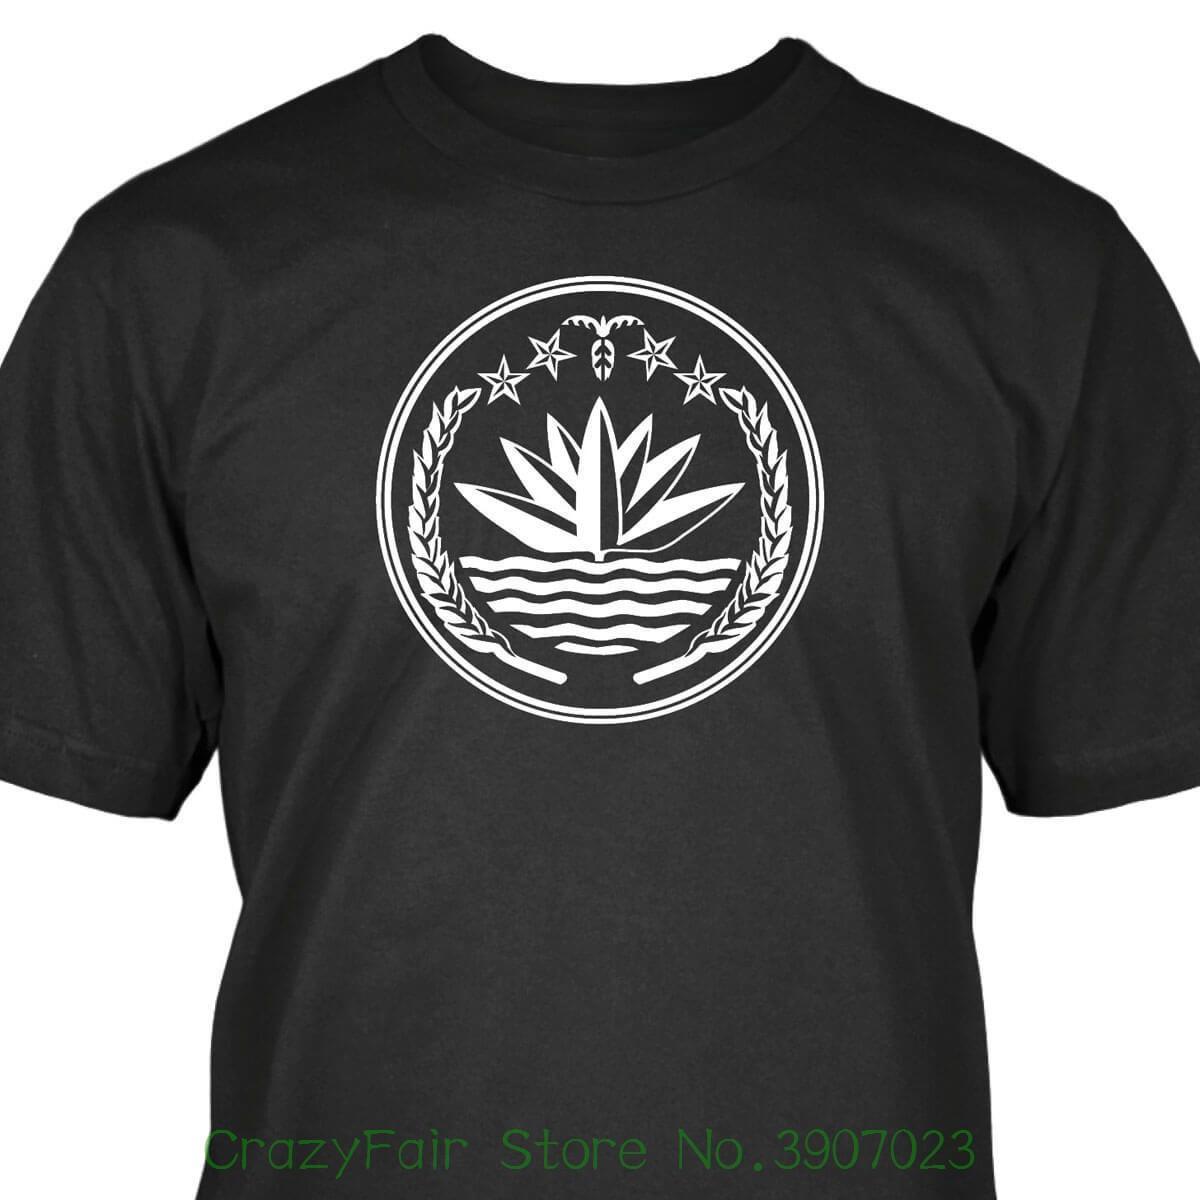 0949efd0ca6 Bangladesh T Shirt Top Tee 100% Cotton Humor Men Crewneck Tee Shirts T  Shirts Print Tees Online From Crazyfairstore